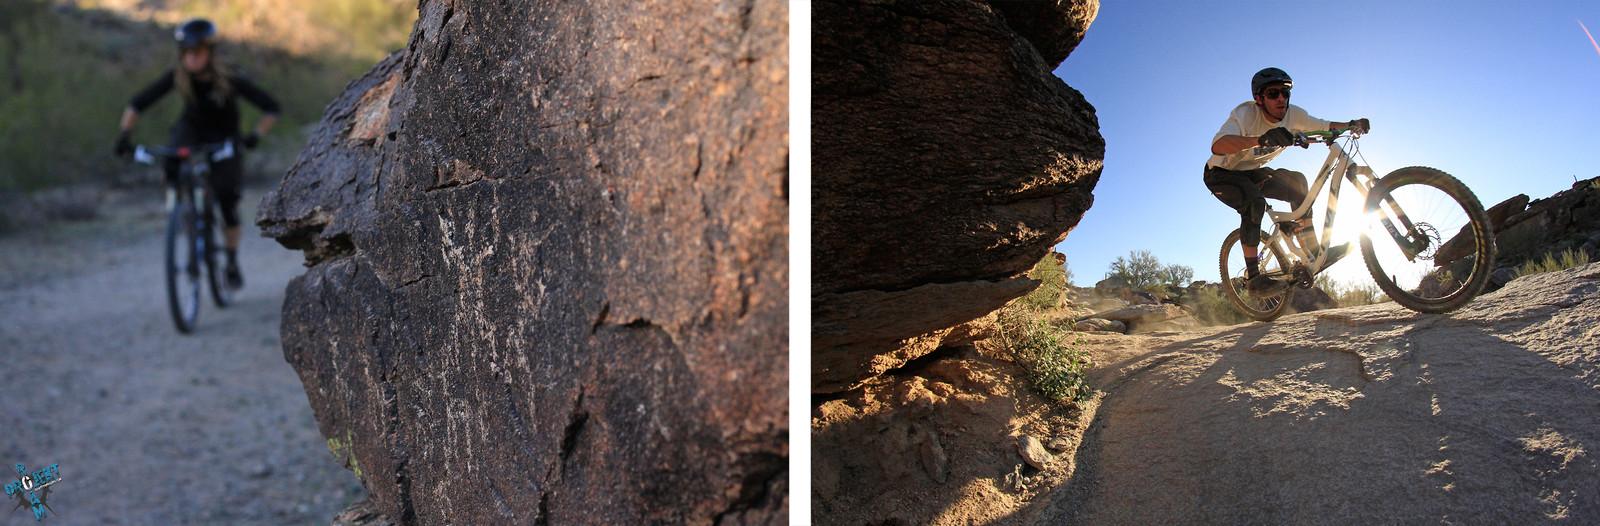 PROJEKT ROAM: Landscapes Vol. 4 - projekt roam - Mountain Biking Pictures - Vital MTB